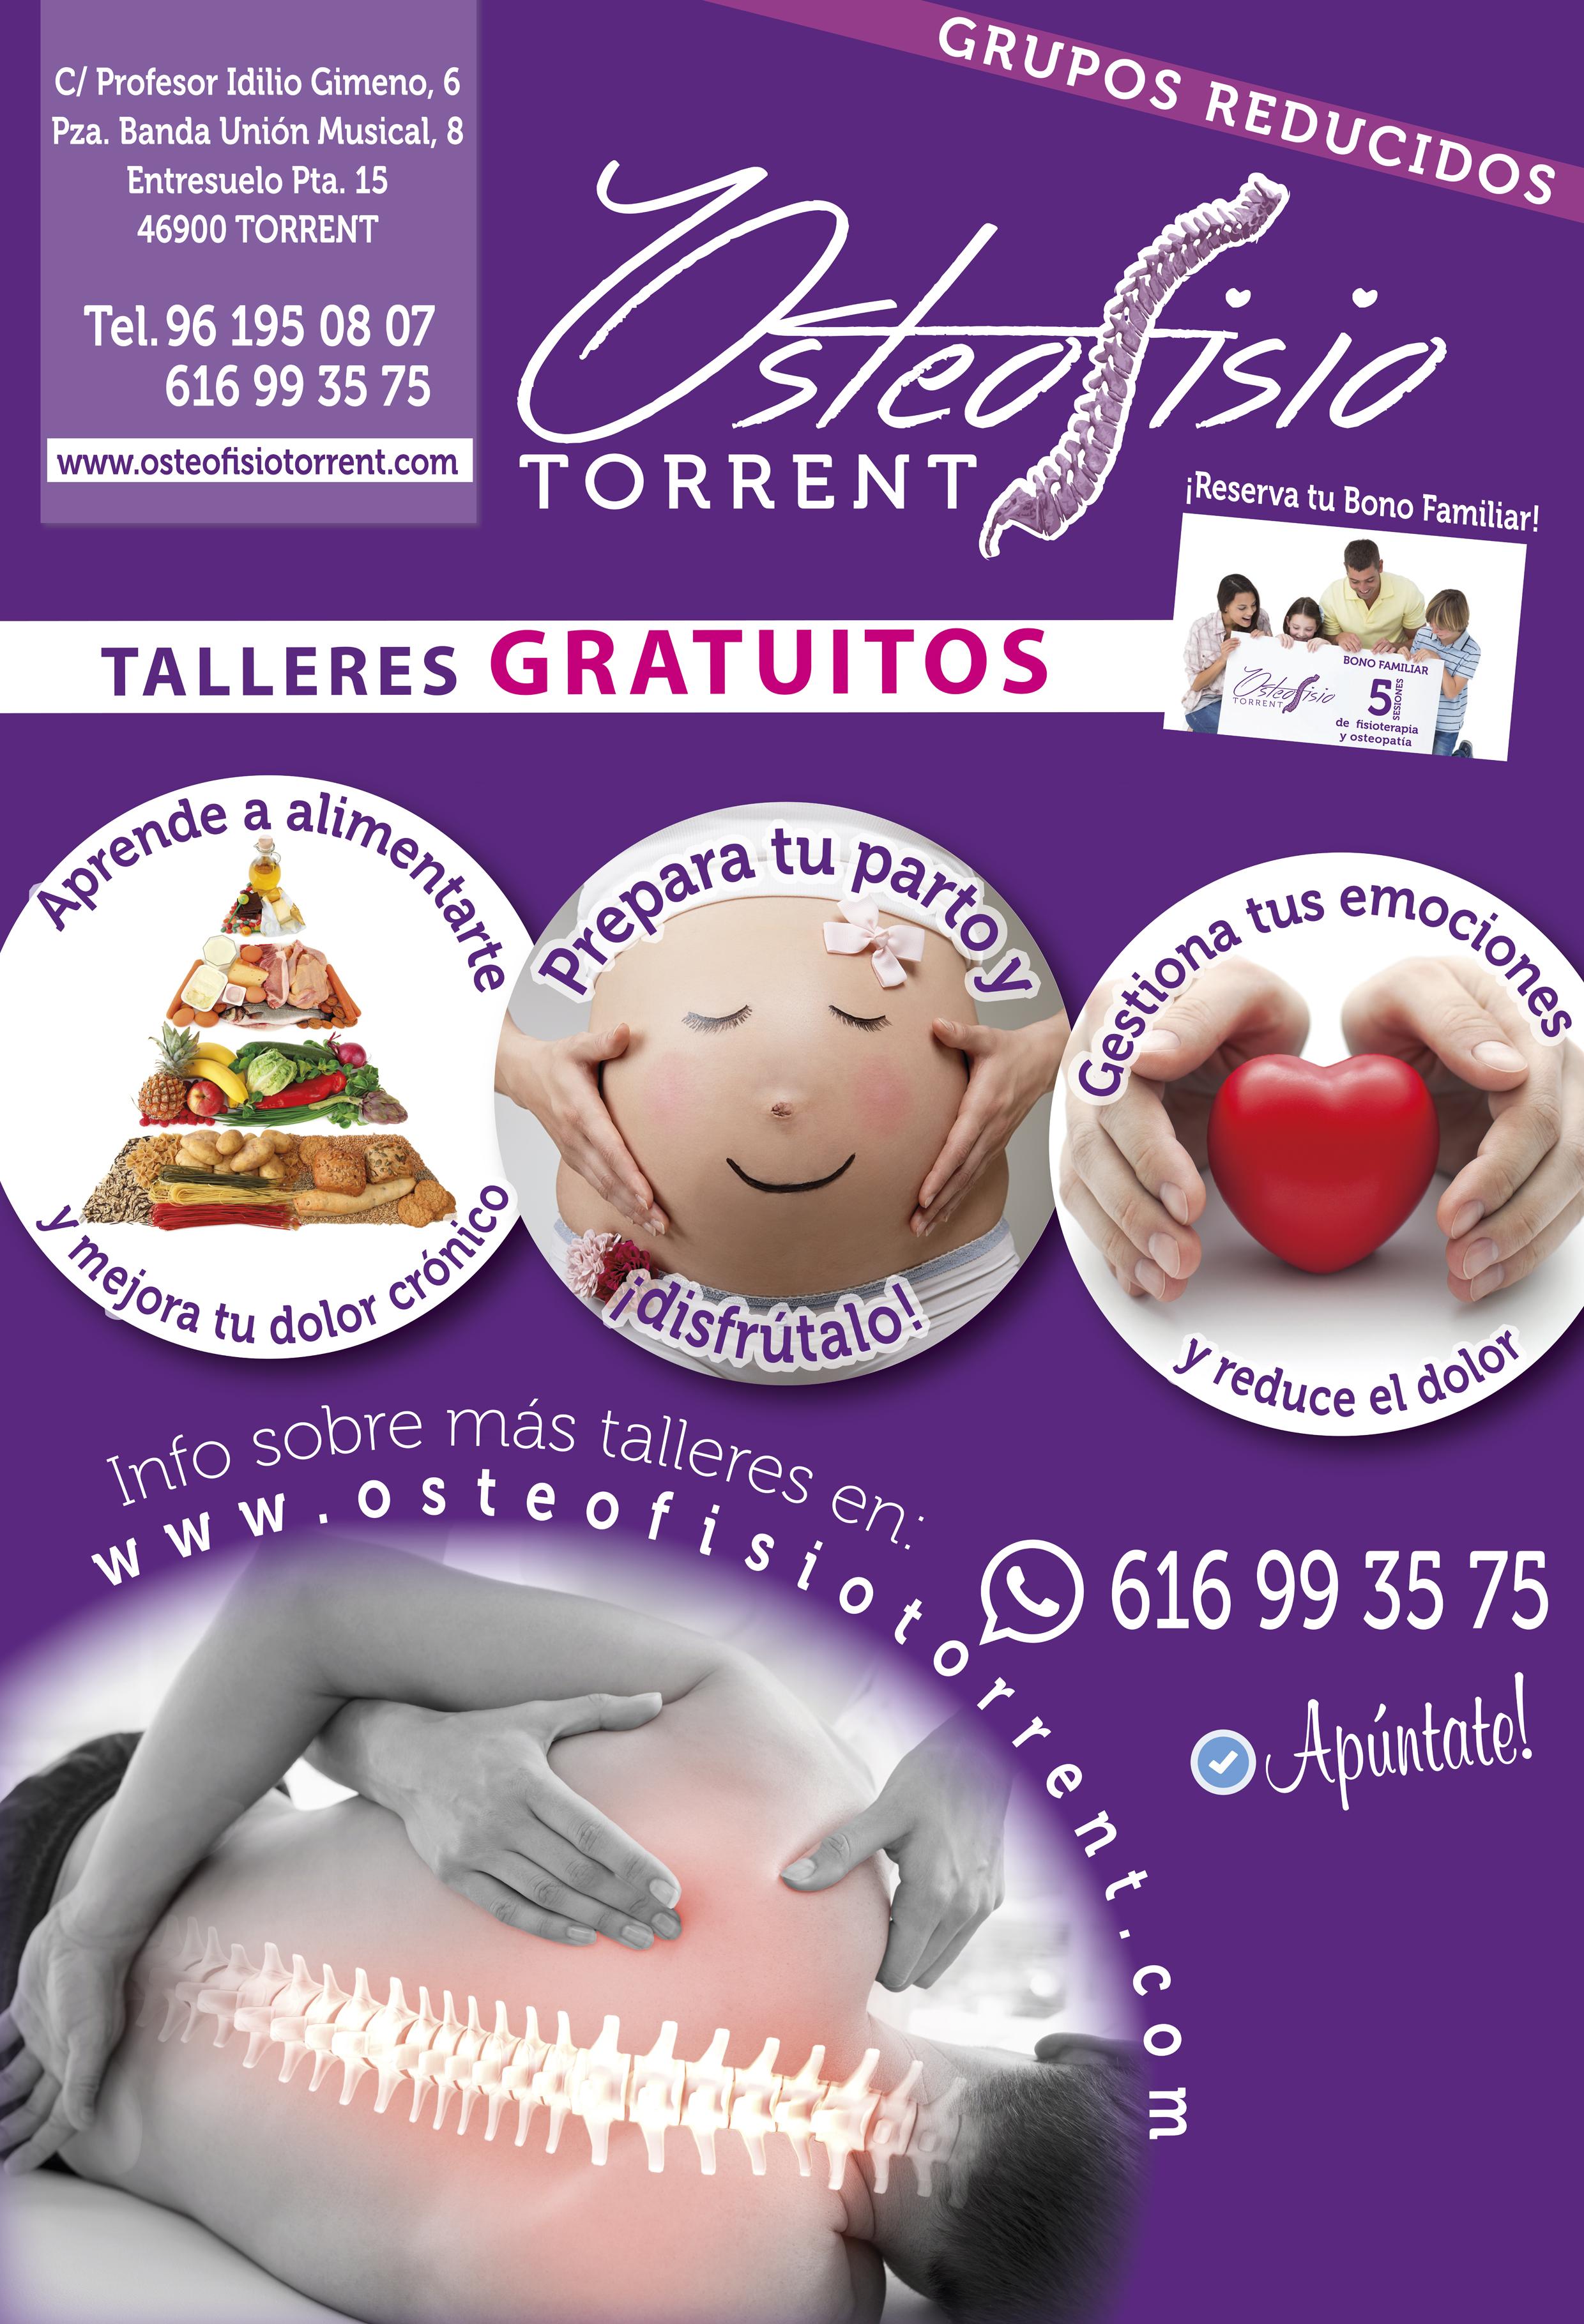 Osteofisio Torrent